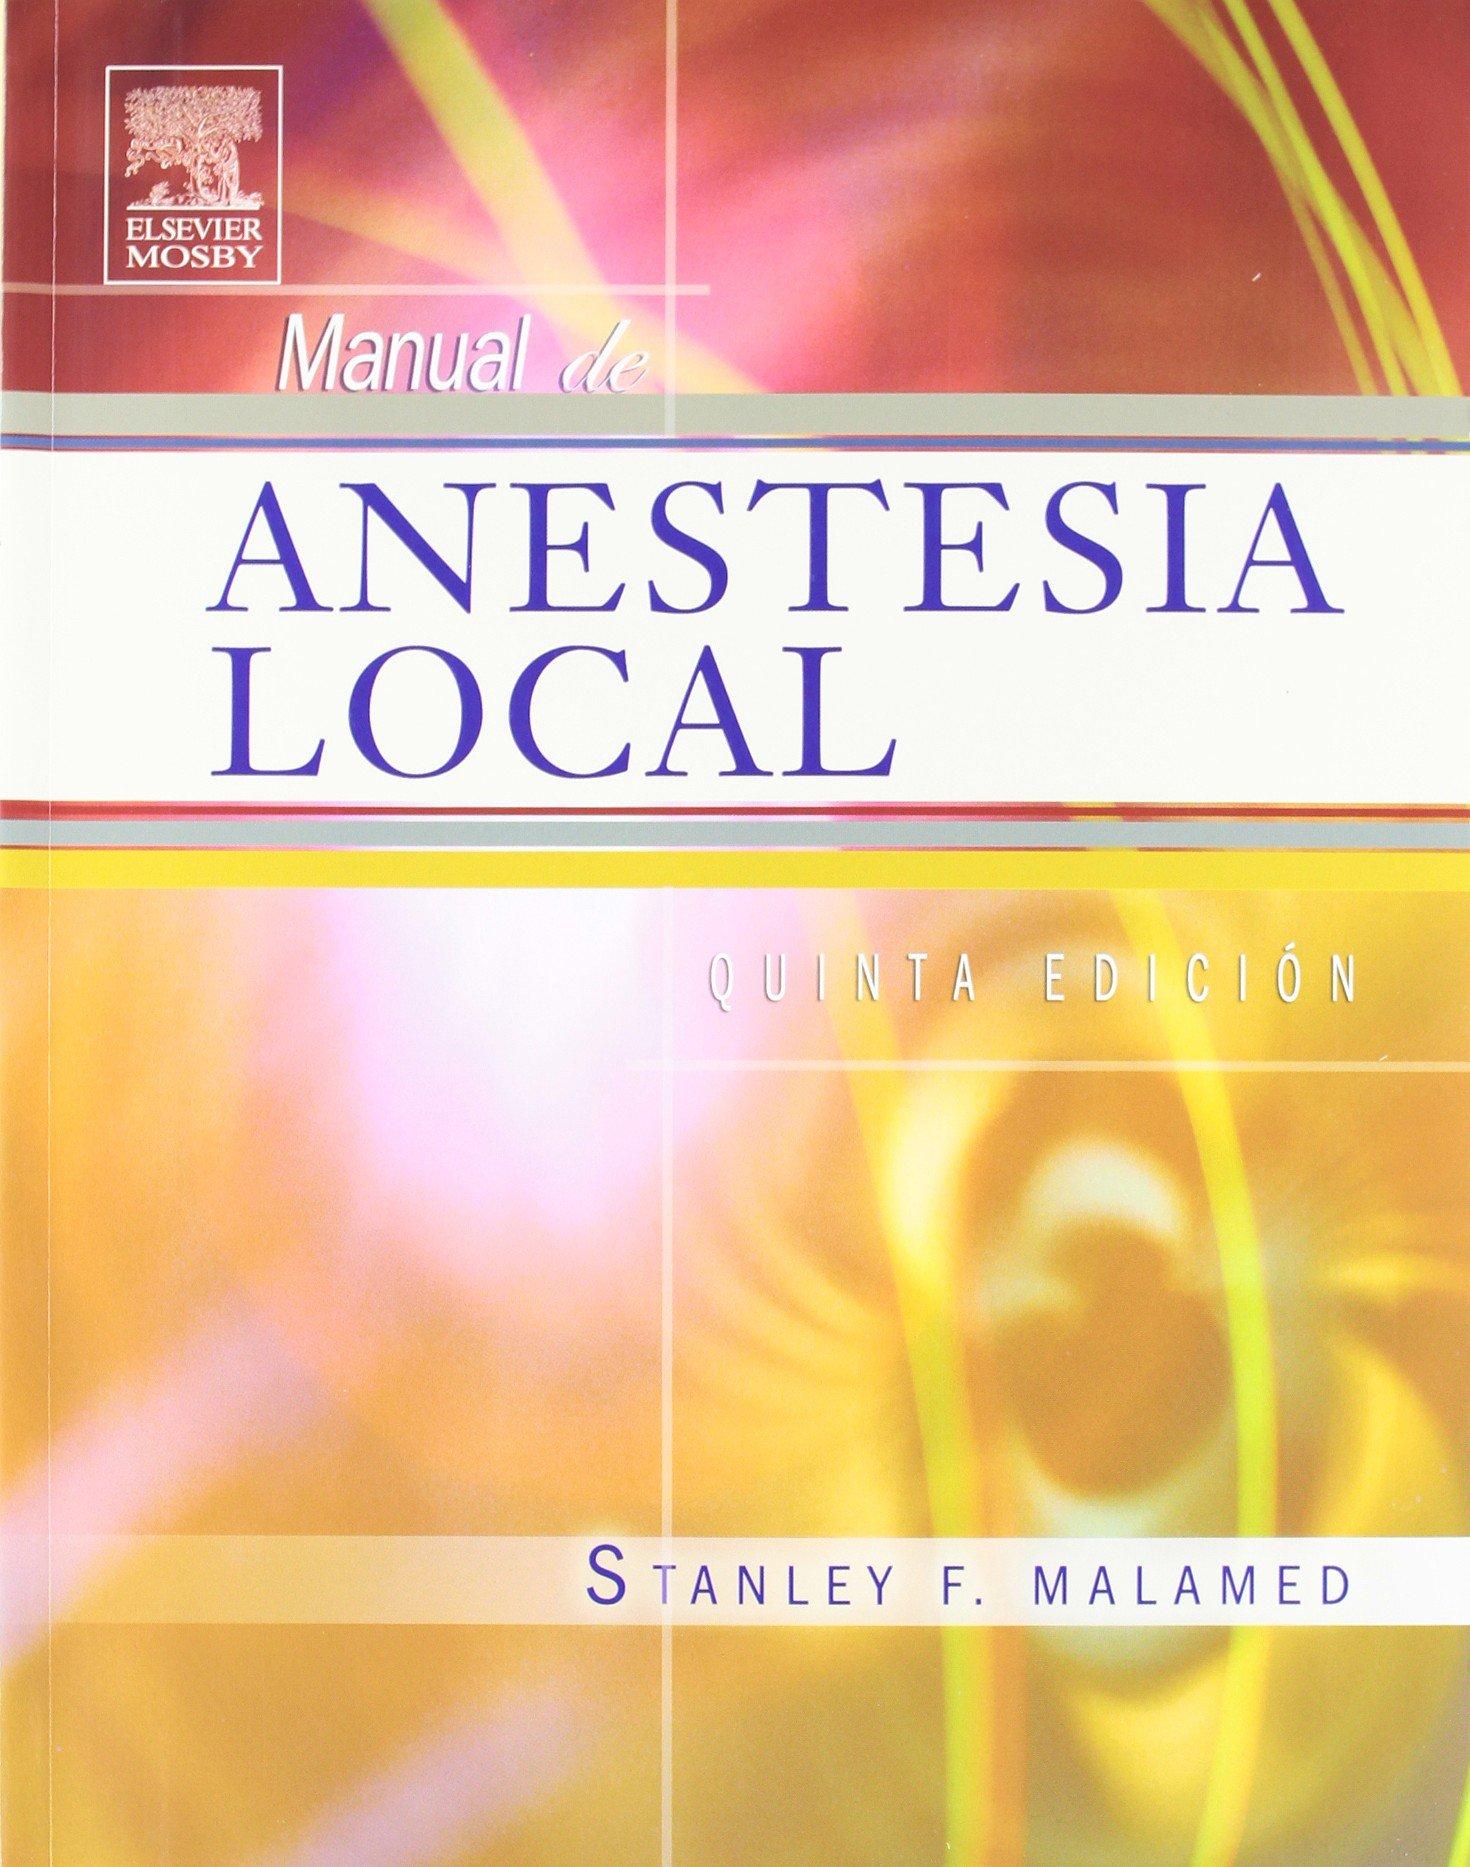 manual de anestesia local stanley malamed pdf gratis